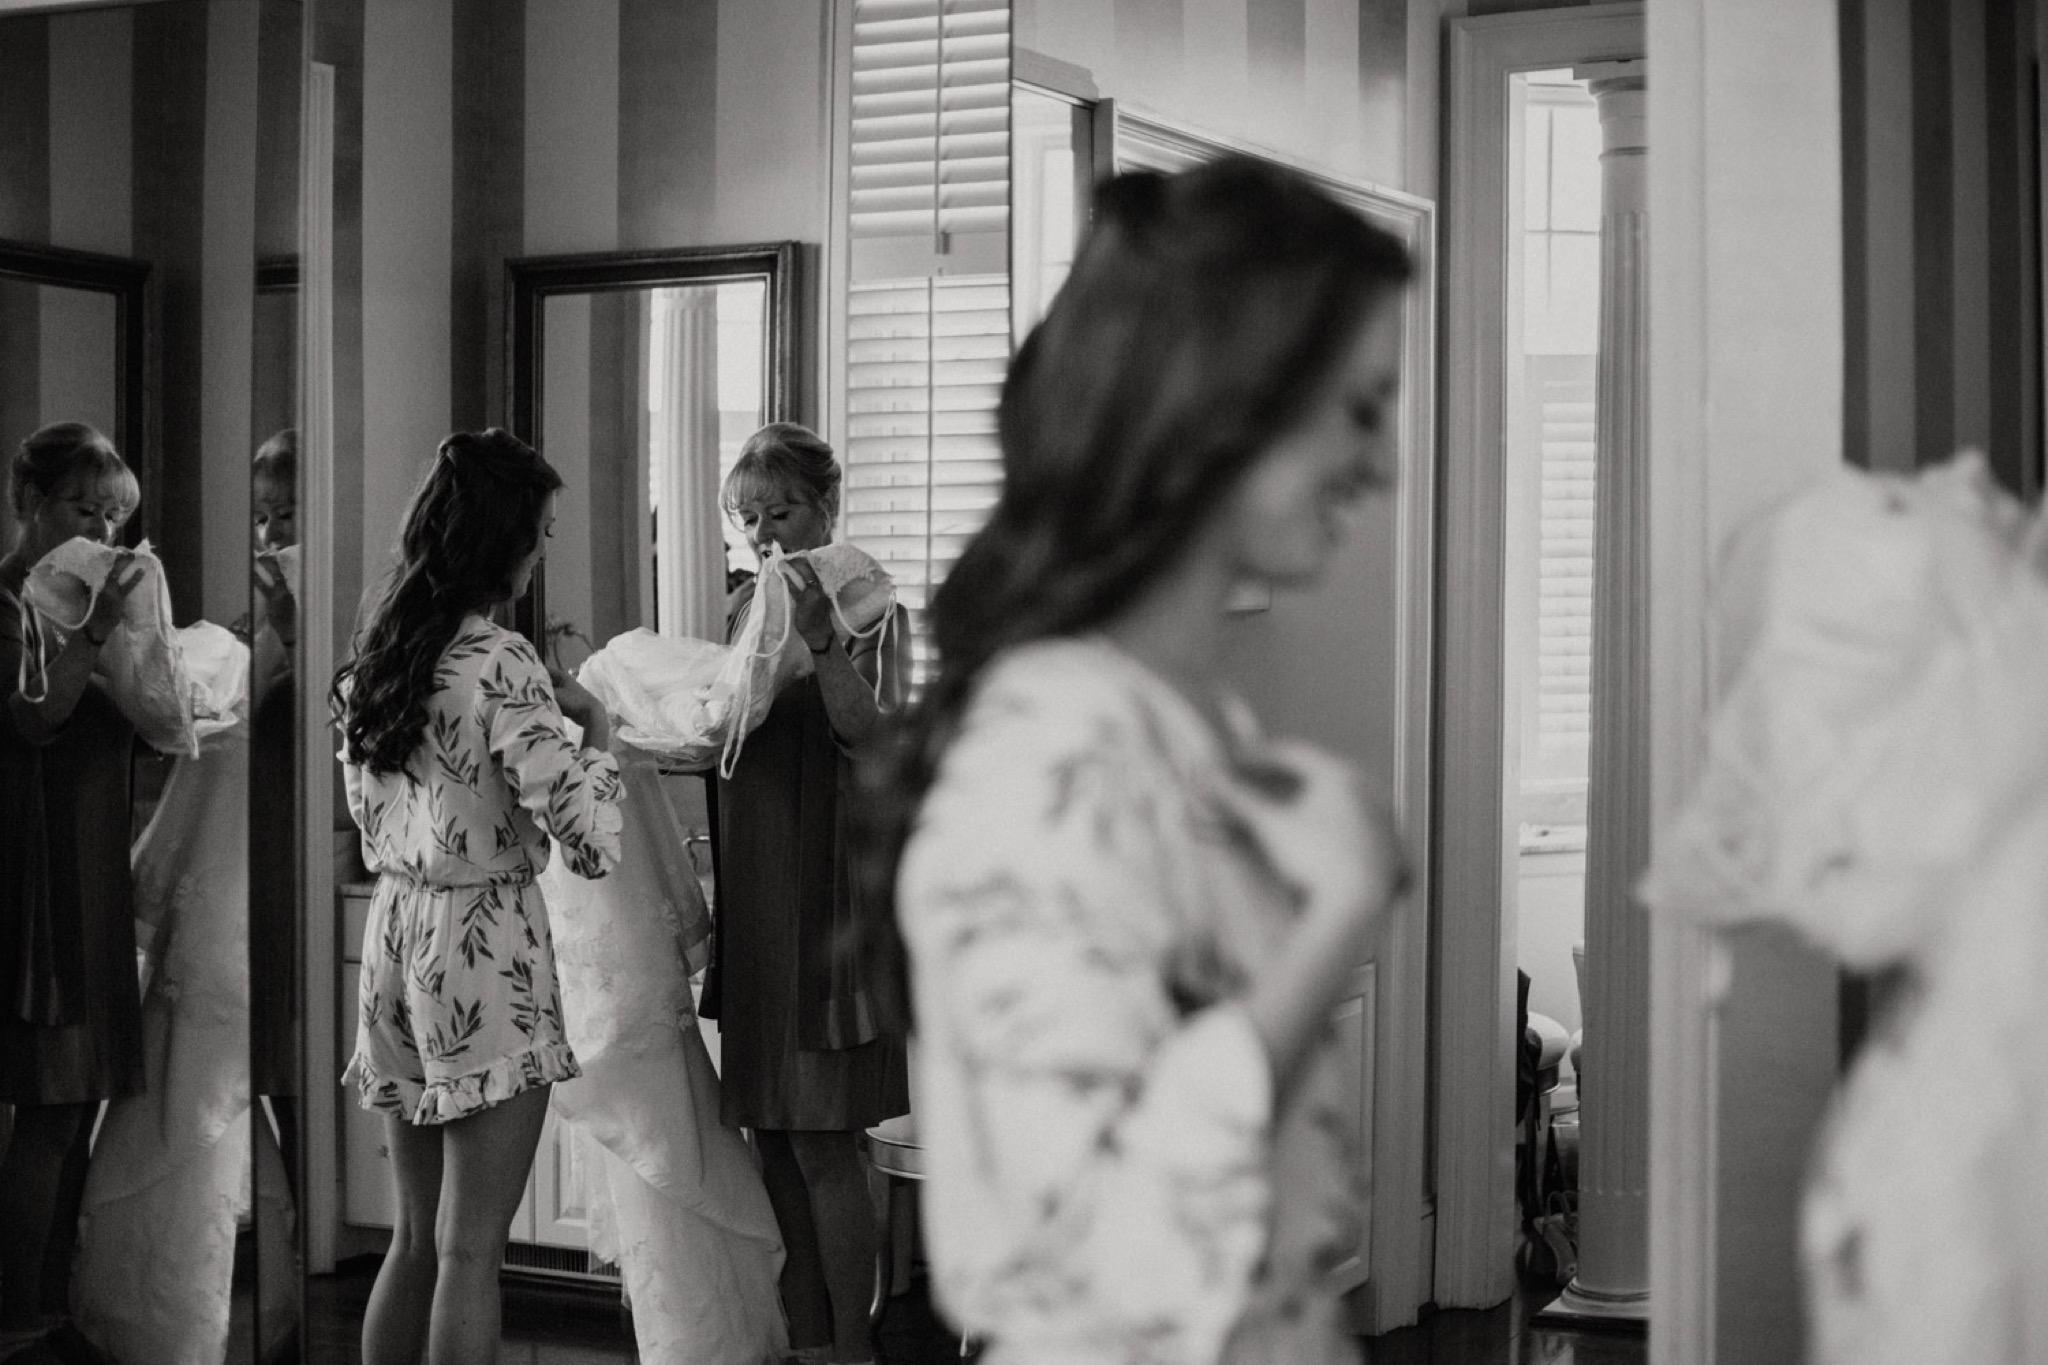 24_West Manor Estate Weddings - Pat Cori Photography-47_bride_VirginiaWeddingPhotographer_gettingready_WestManorEstate_Portraits_Wedding.jpg